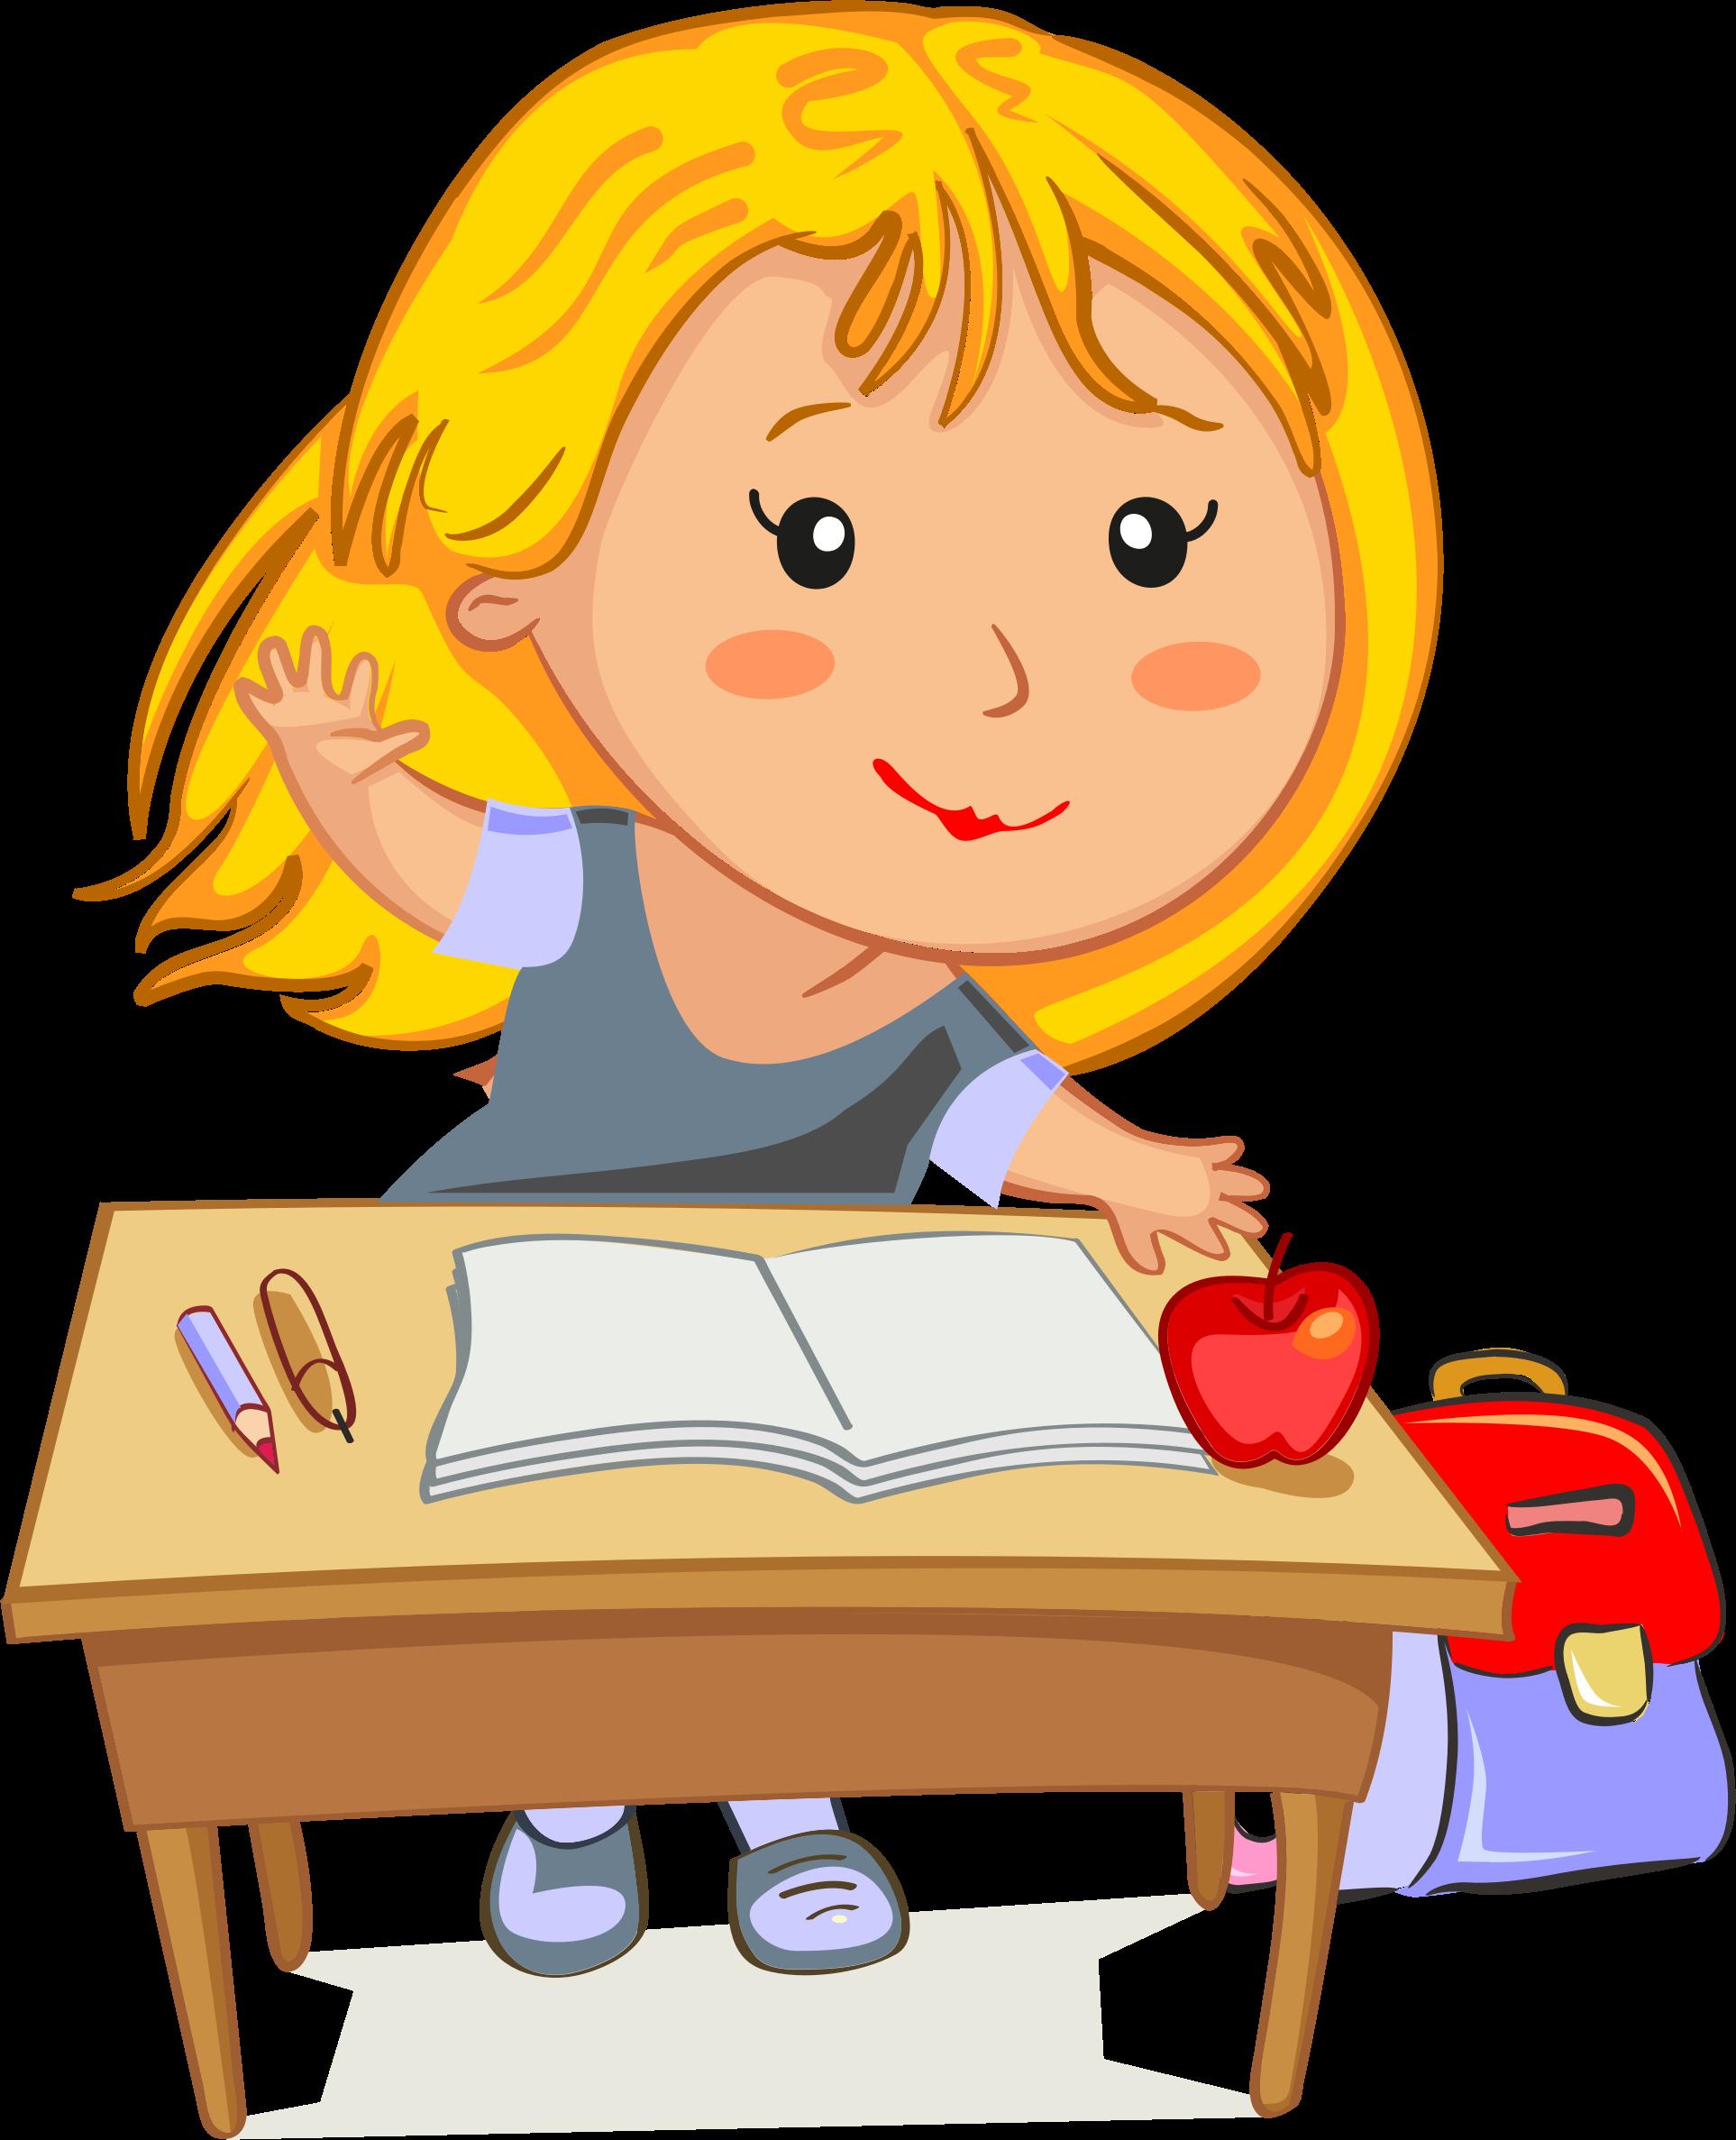 Girl at school clipart vector transparent stock Clipart - Blonde Girl Raising Her Hand Sitting At Her Desk In School vector transparent stock